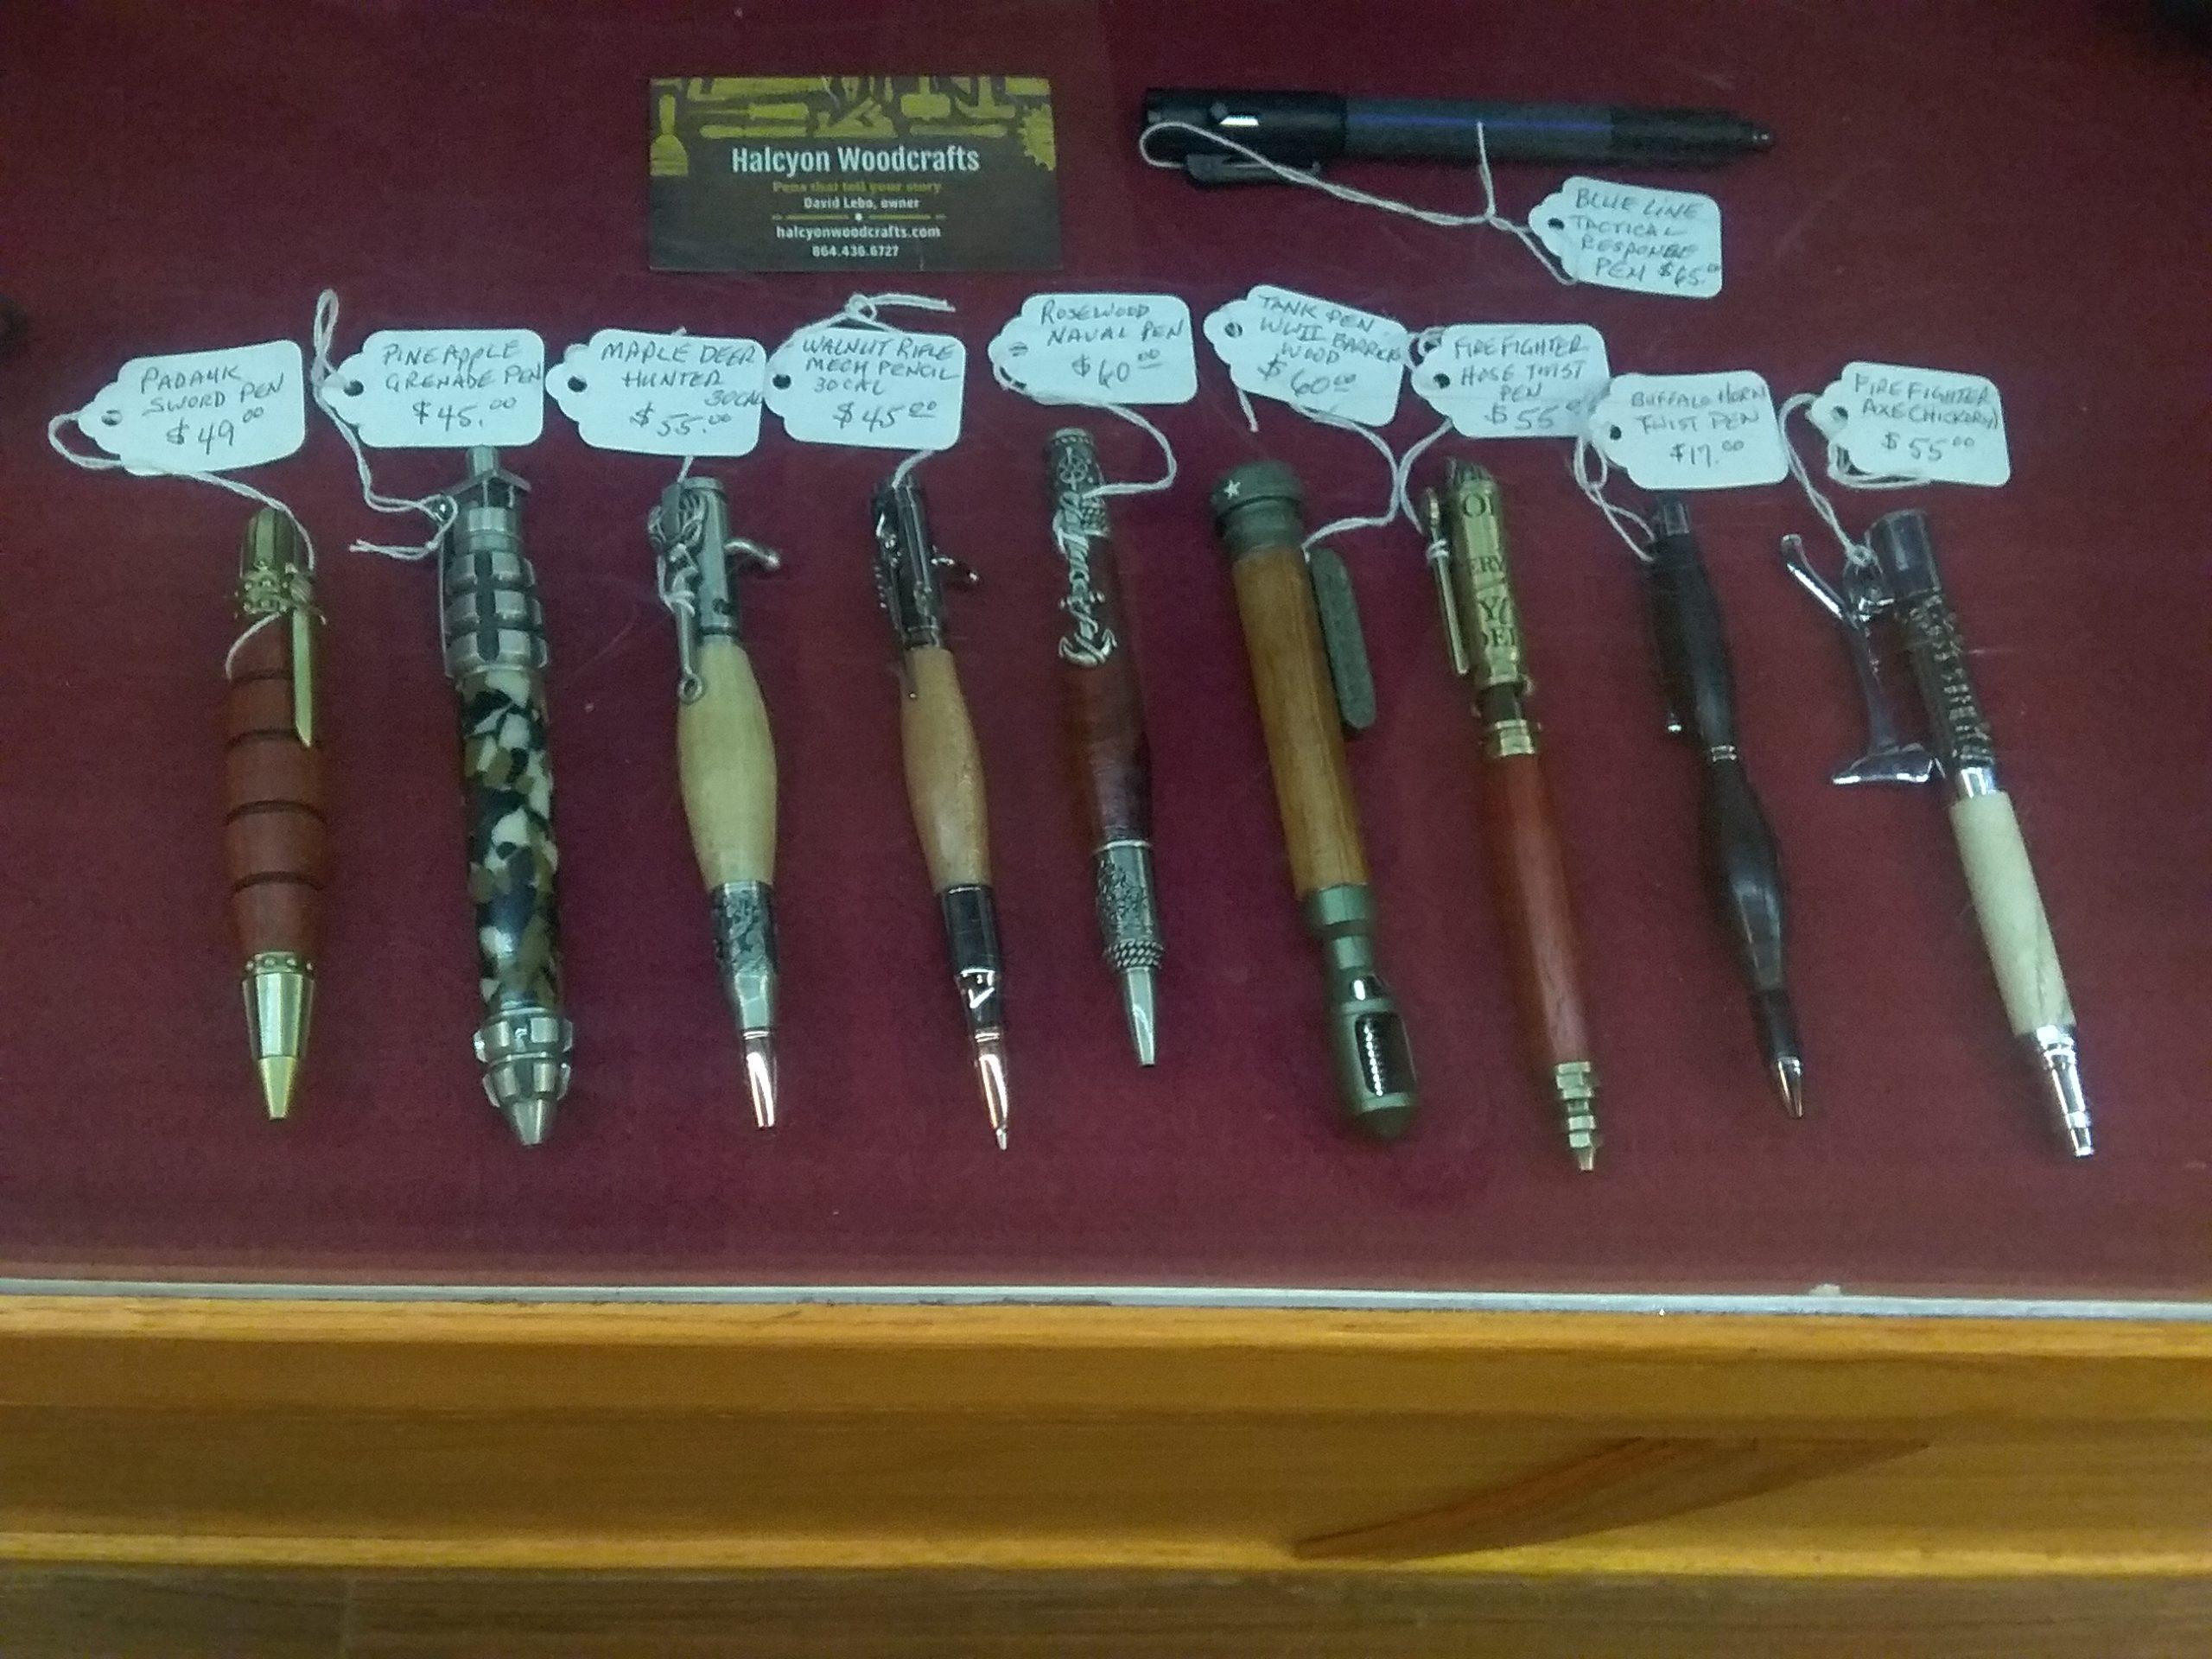 Halcyon Pens